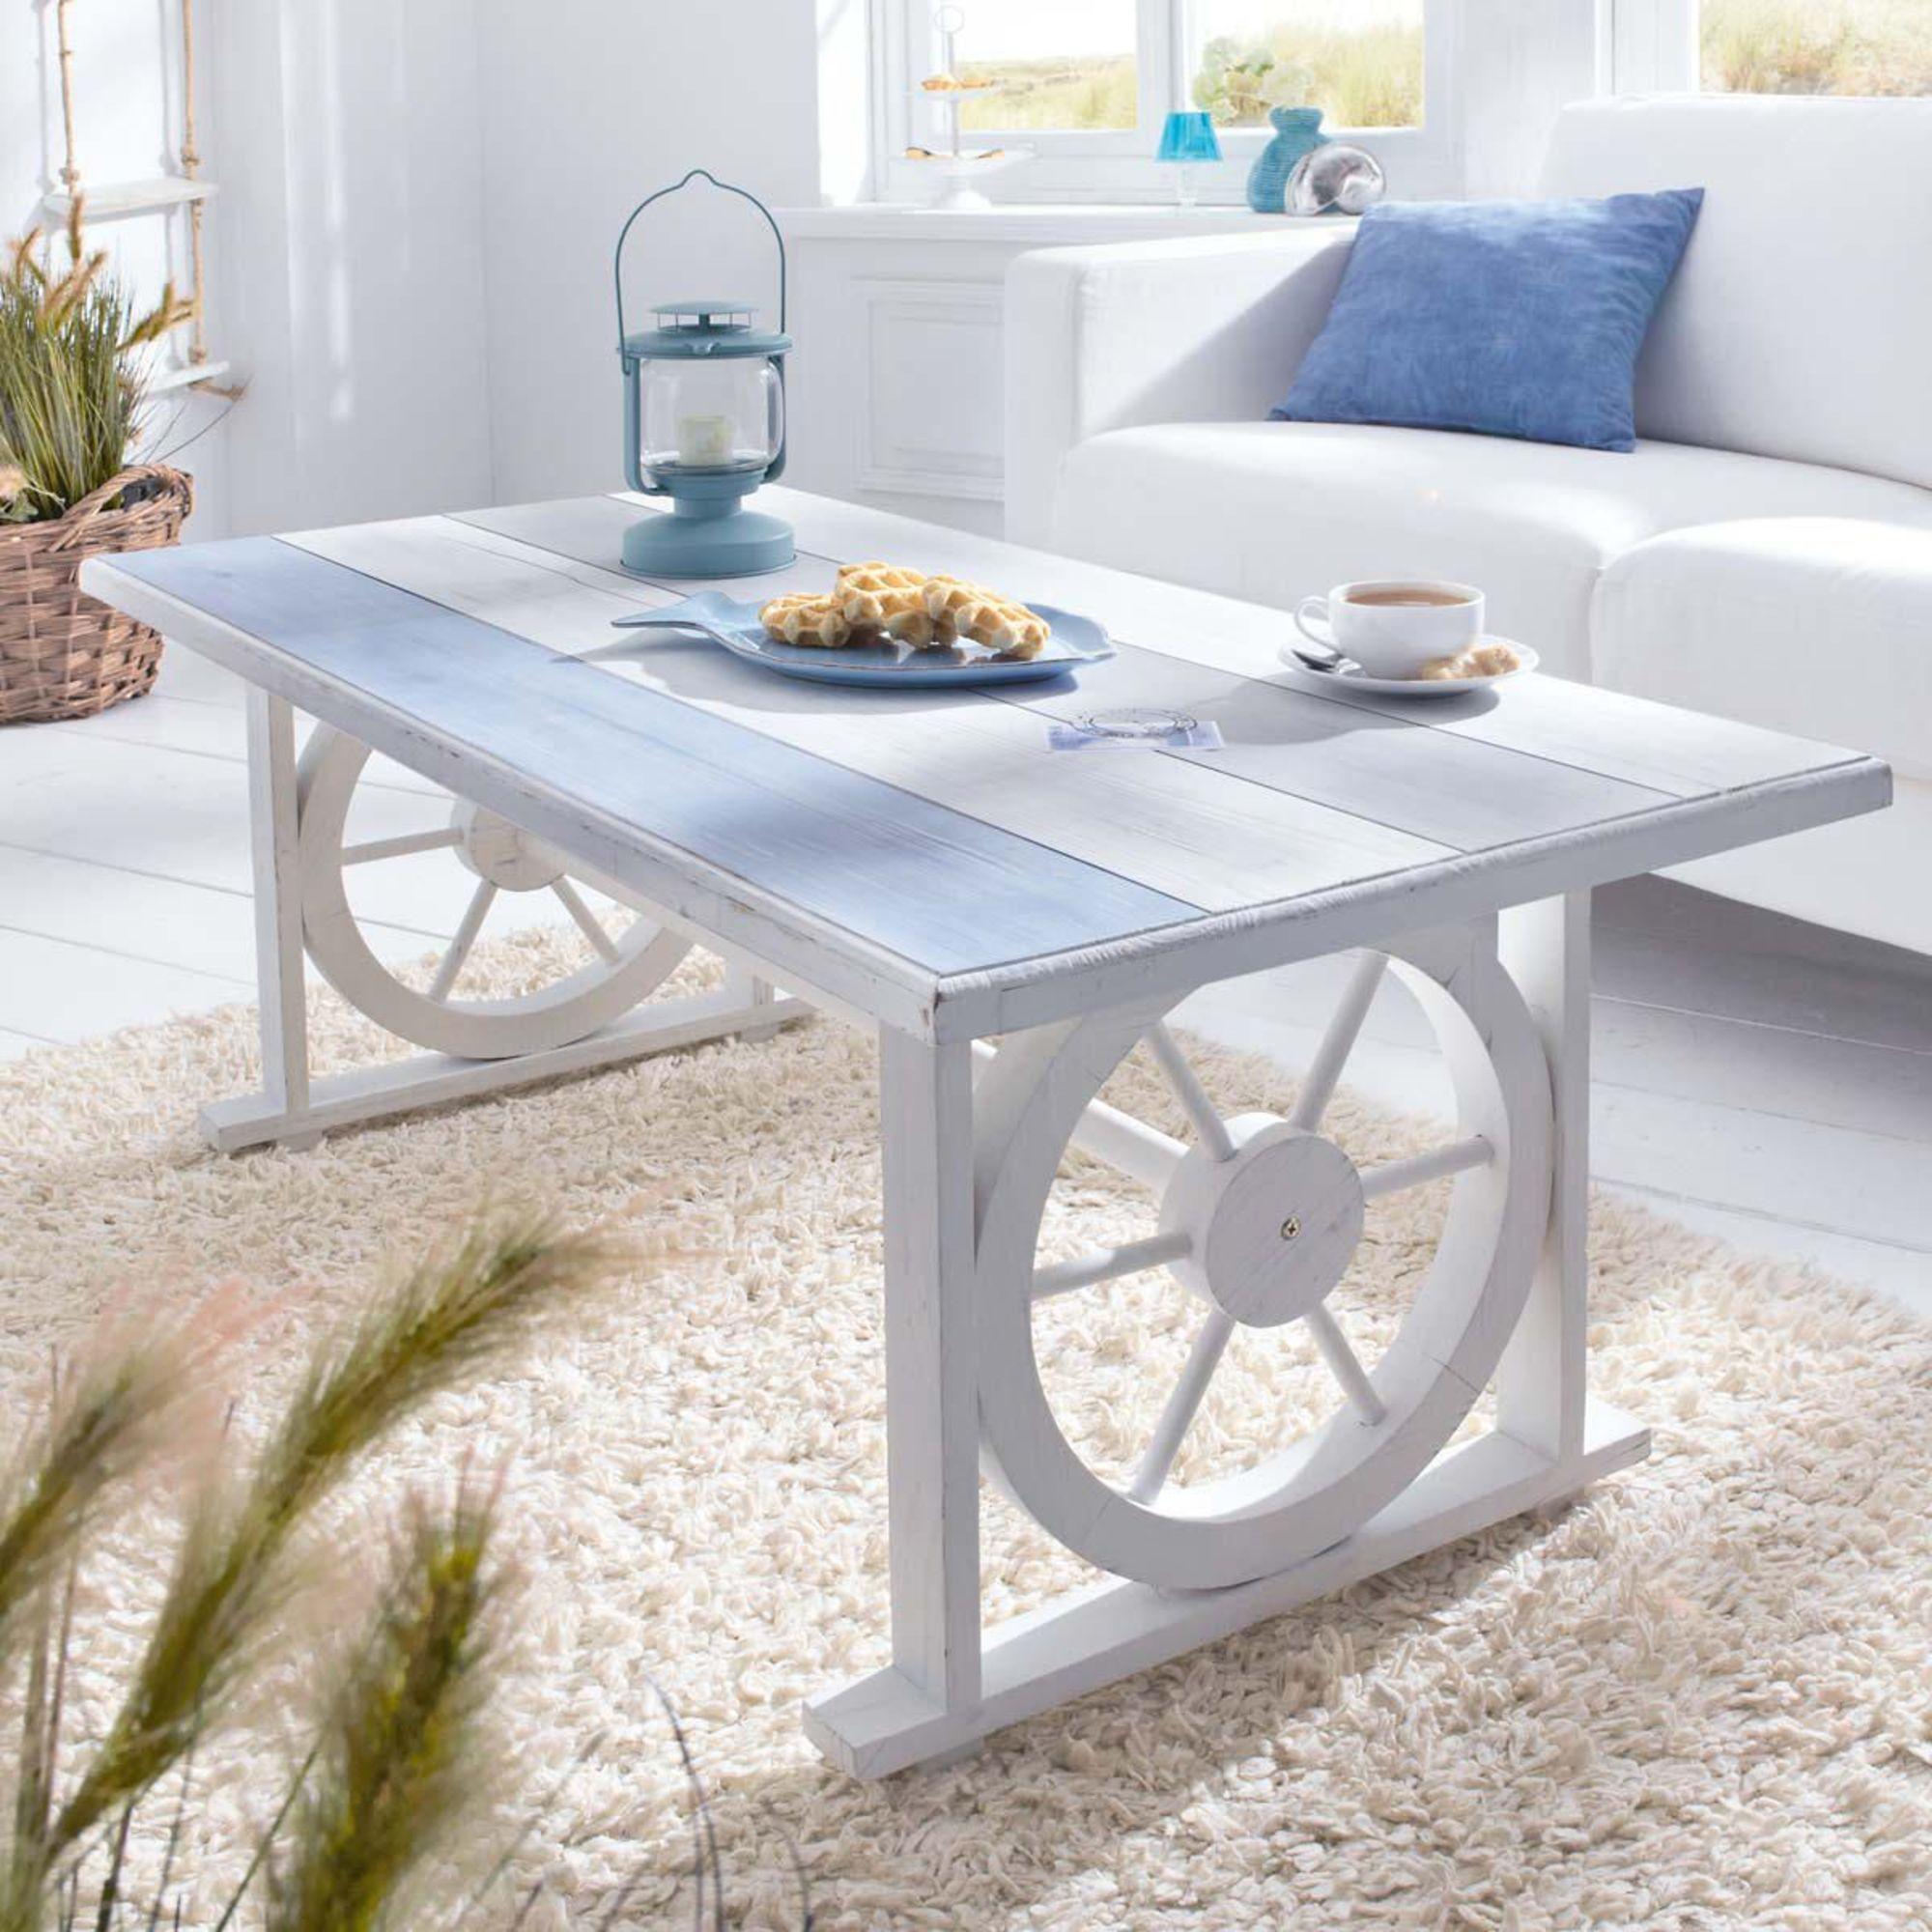 maritime couchtische infos empfehlungen. Black Bedroom Furniture Sets. Home Design Ideas